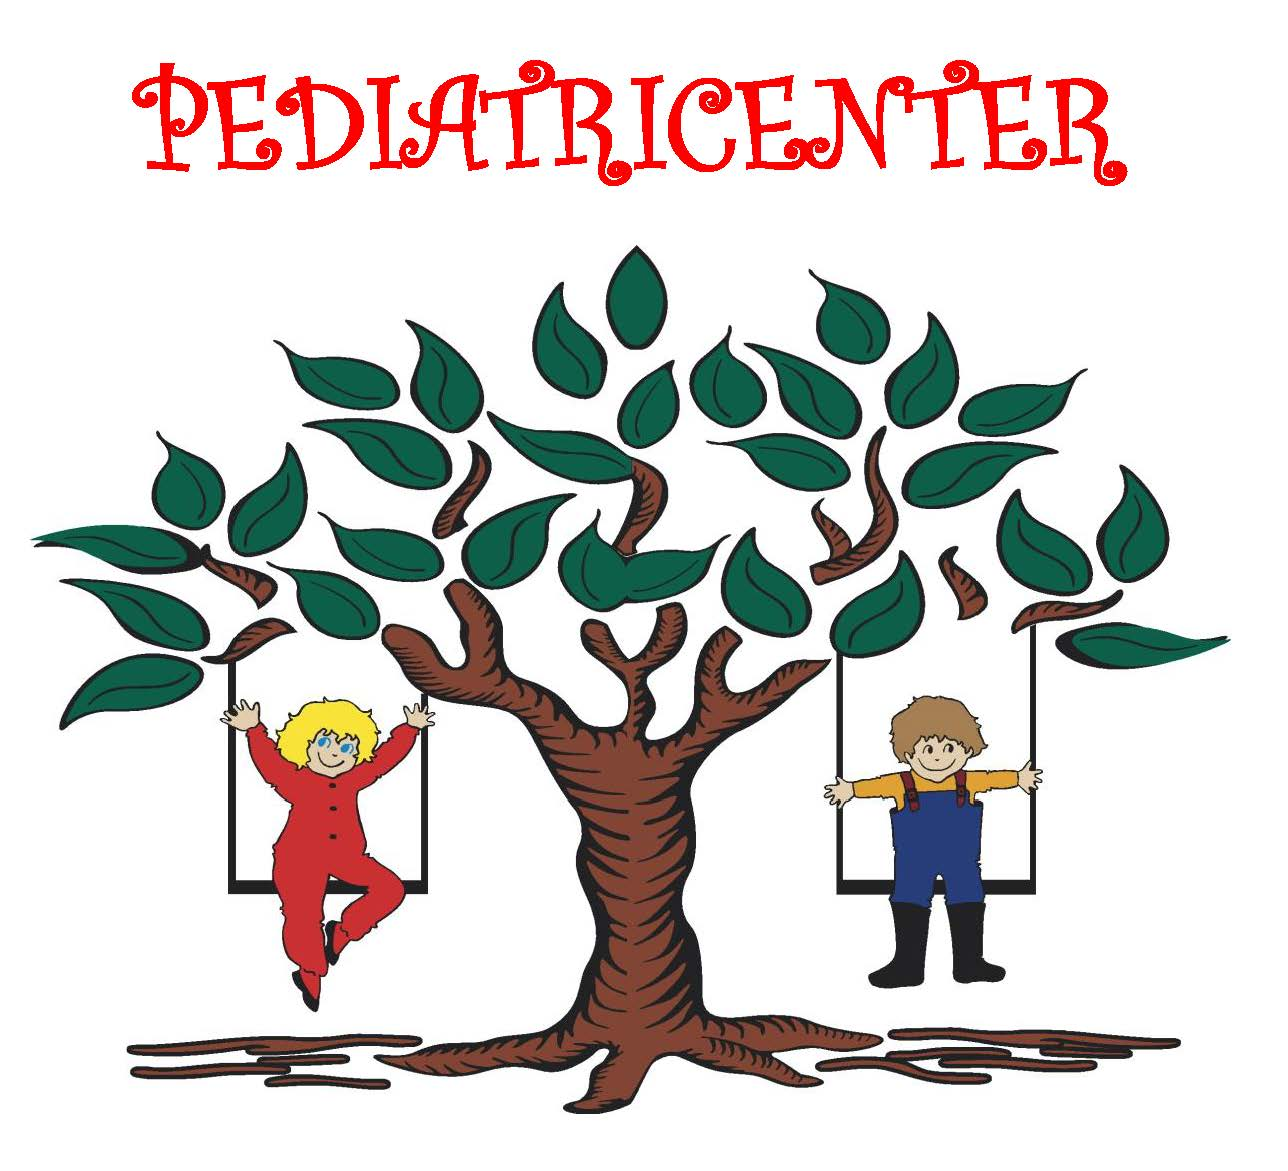 Pediatricenter logo